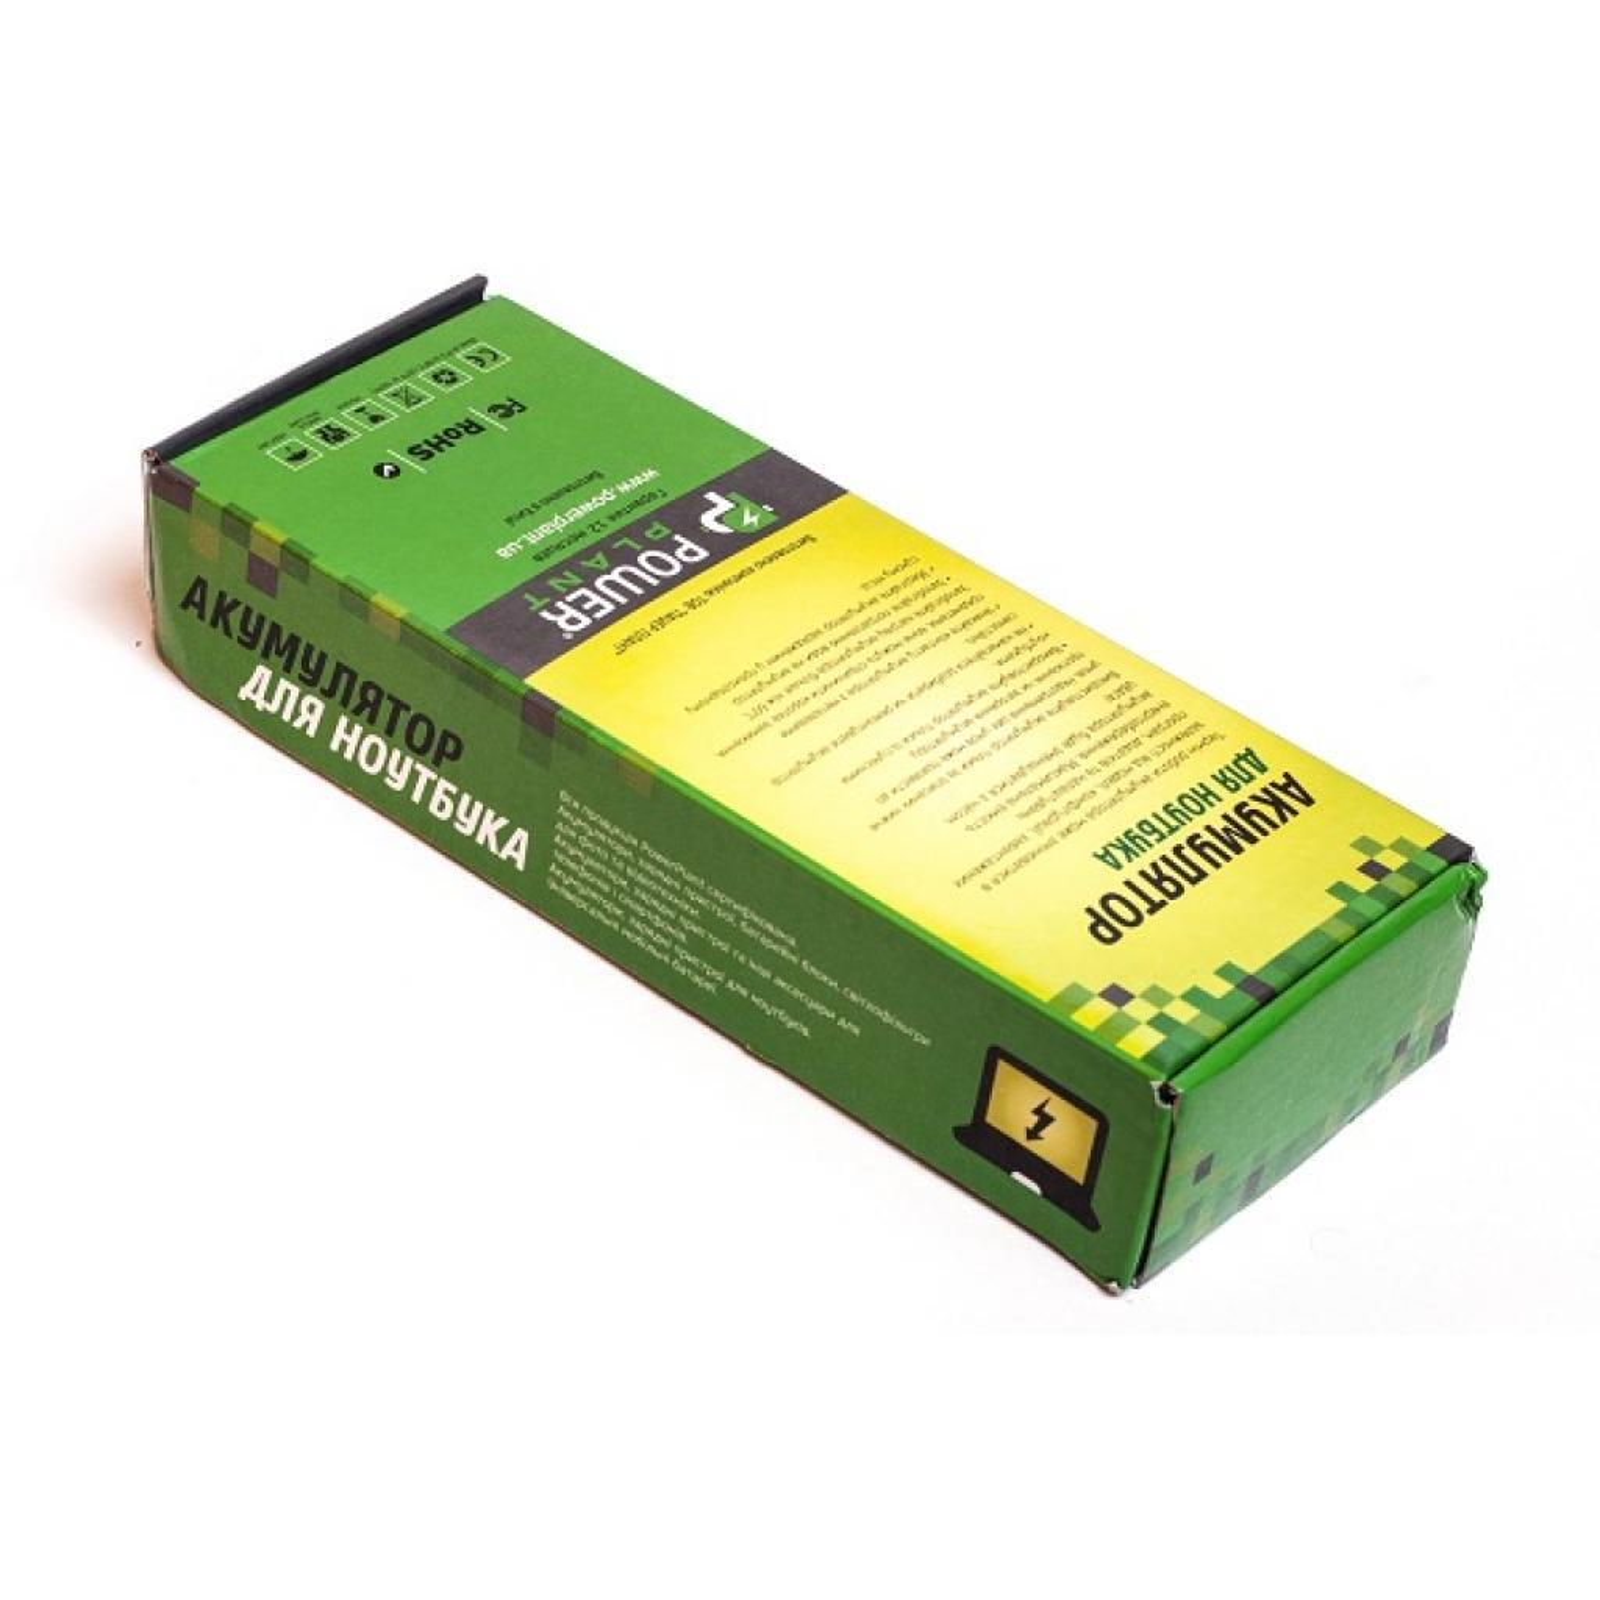 Аккумулятор для ноутбука DELL Vostro 1320 (N956C, DE 1320 3S2P) 11.1V 5200mAh PowerPlant (NB00000108) изображение 2